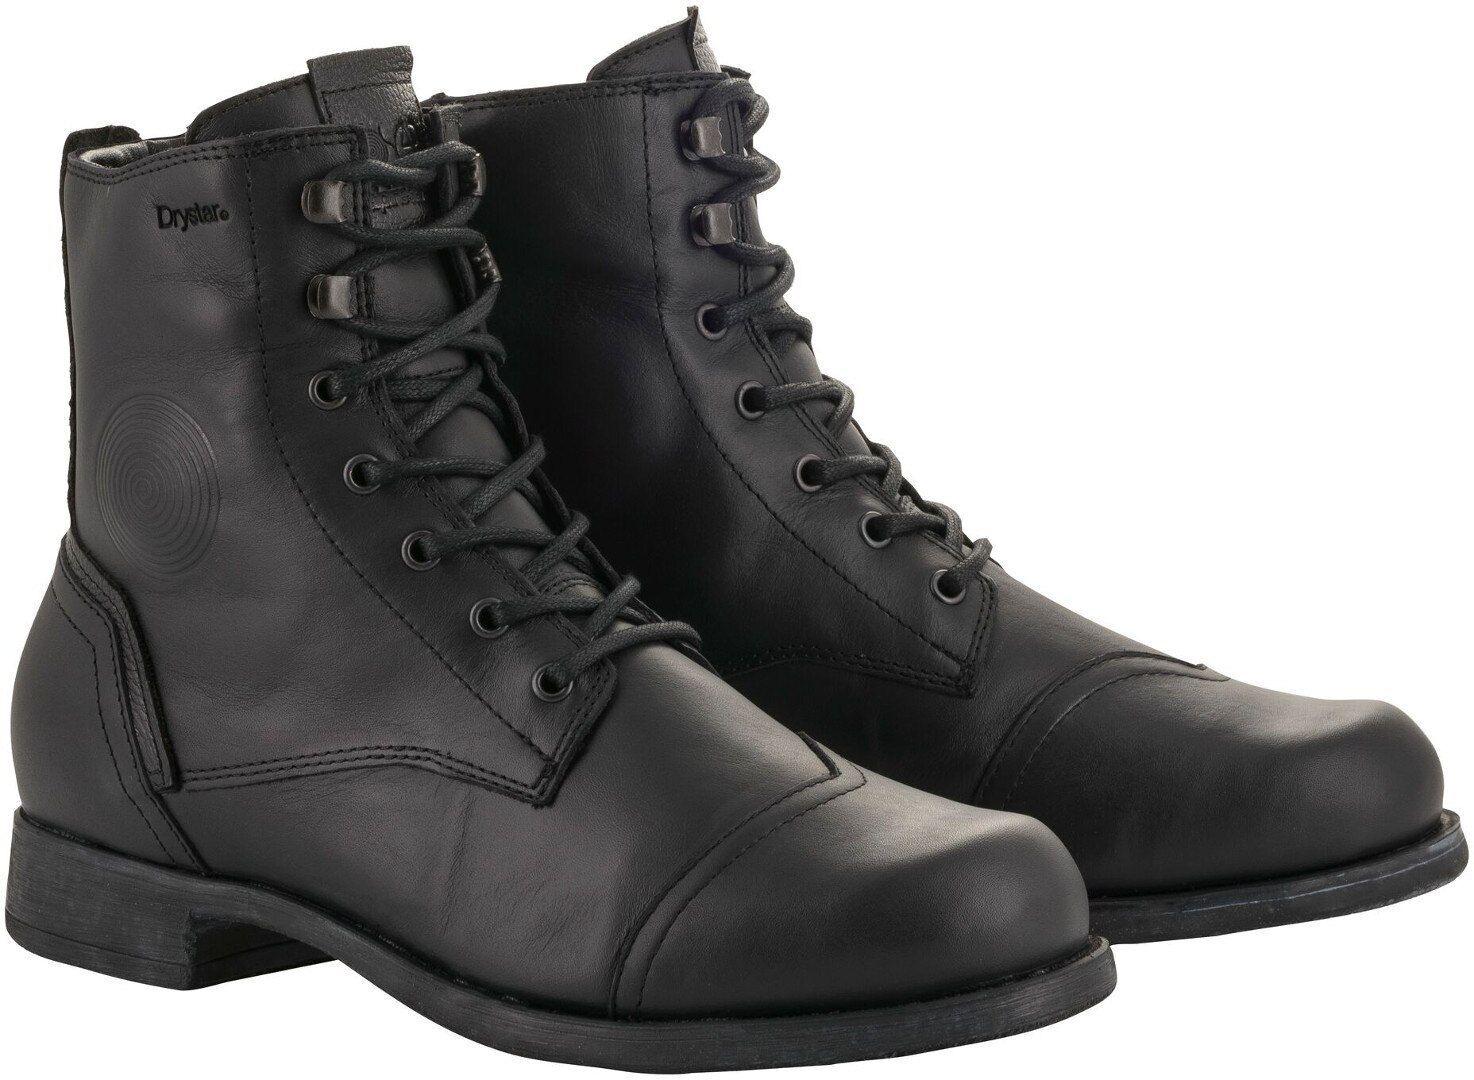 Alpinestars Distinct Drystar Motorcycle Boots Black 45